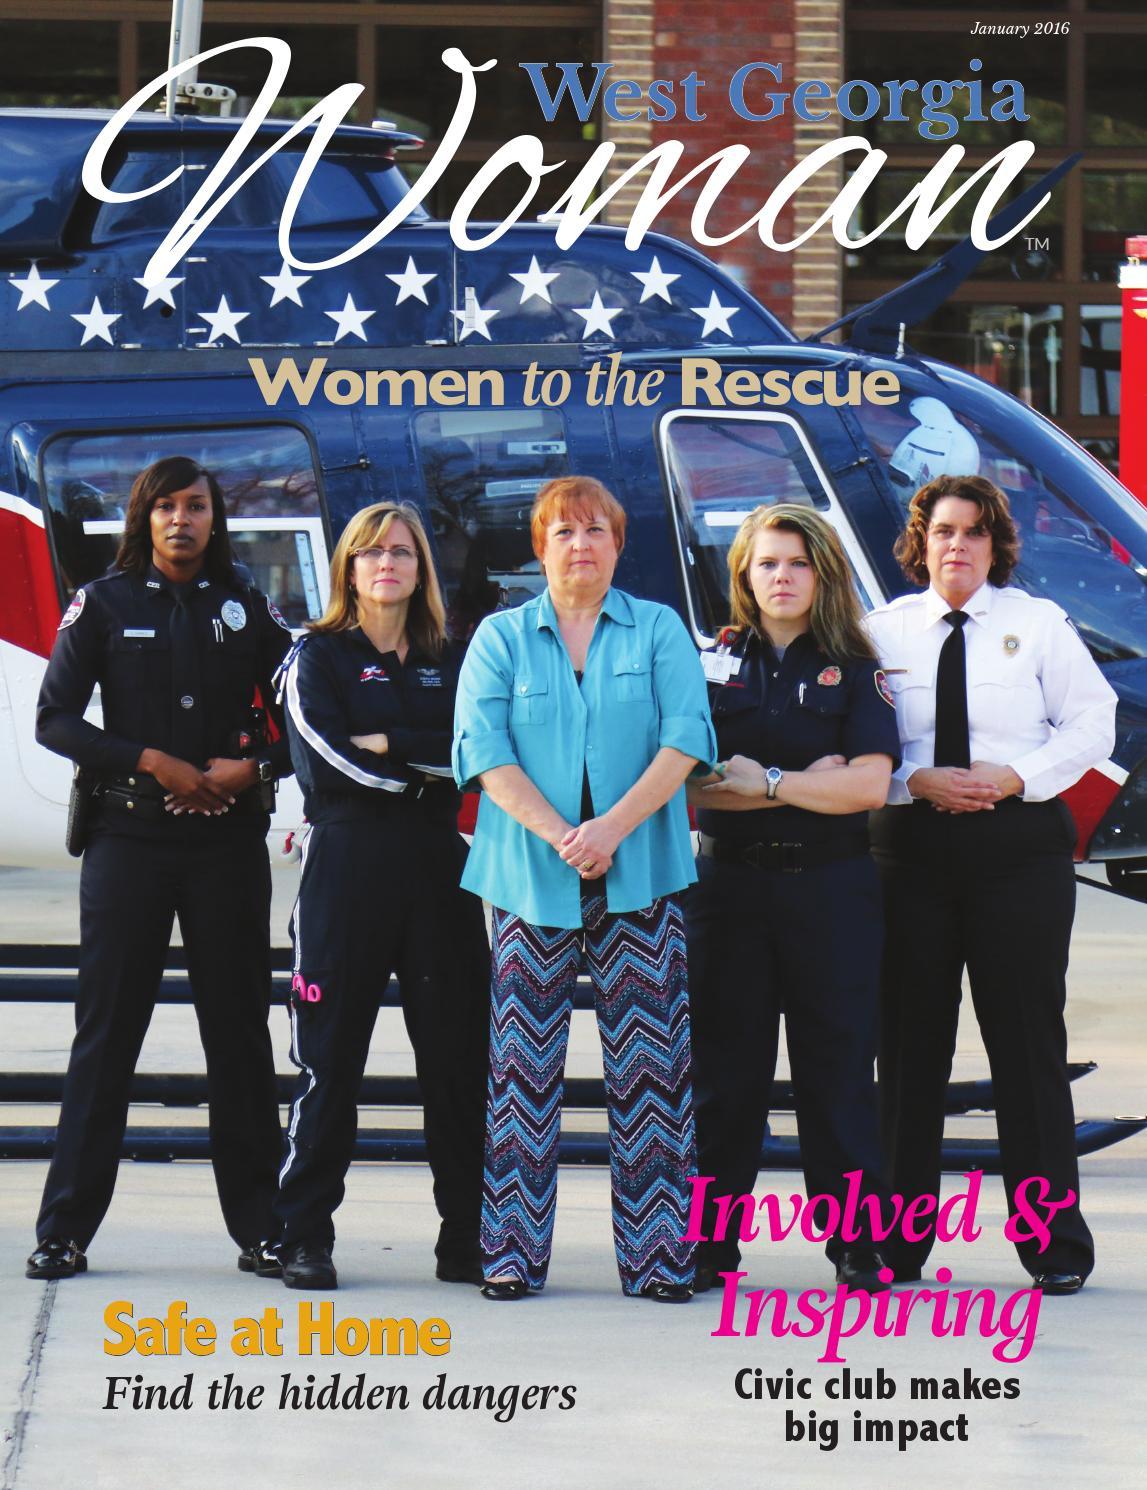 West Georgia Woman Magazine January 2016 by Angel Media, LLC - issuu